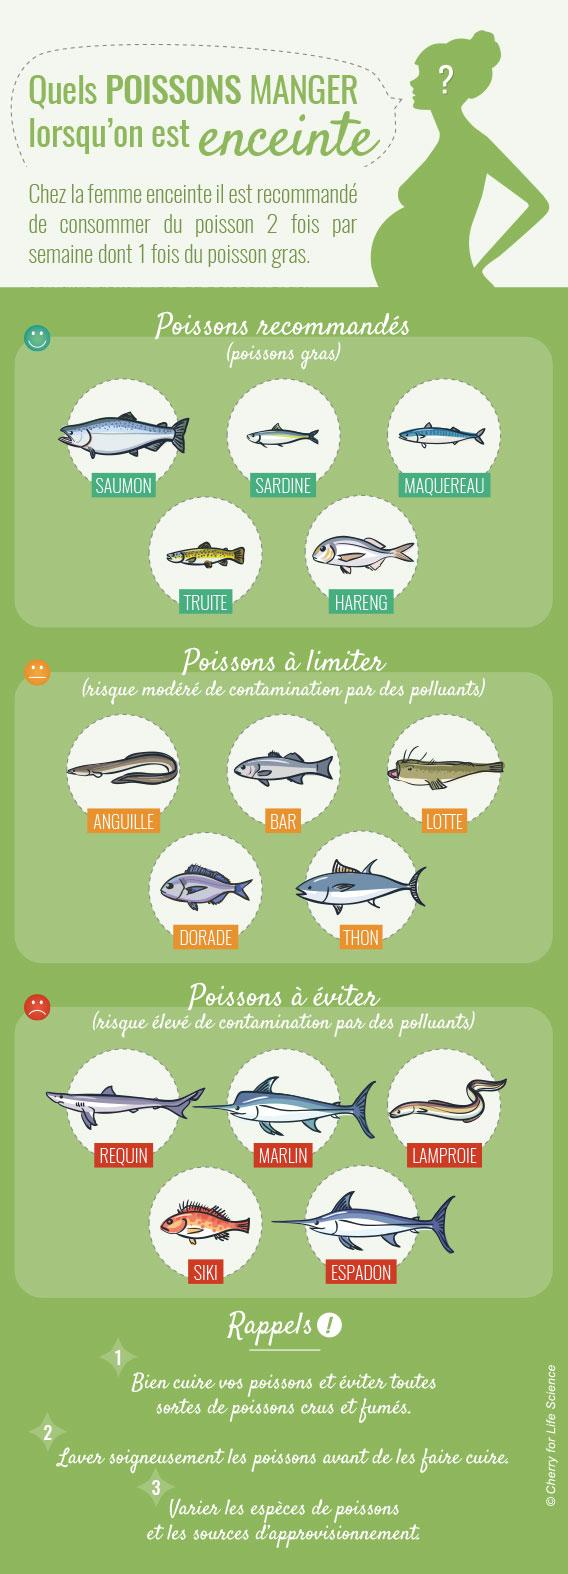 Alimentation pendant la grossesse d sagr ments for Alimentation des poissons rouges